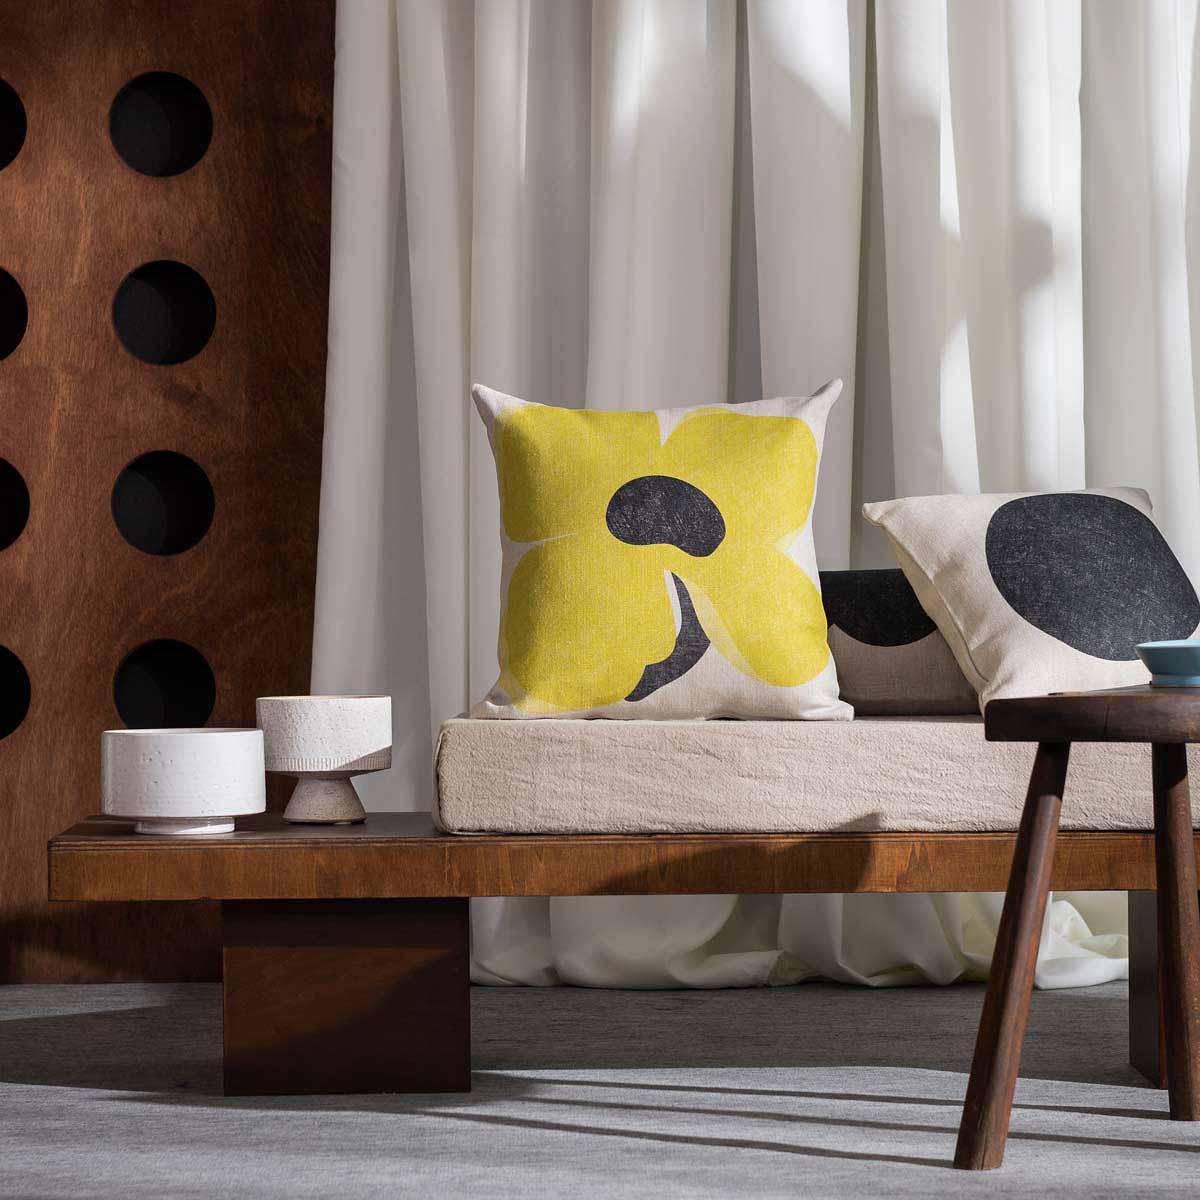 ambiance moderniste design français